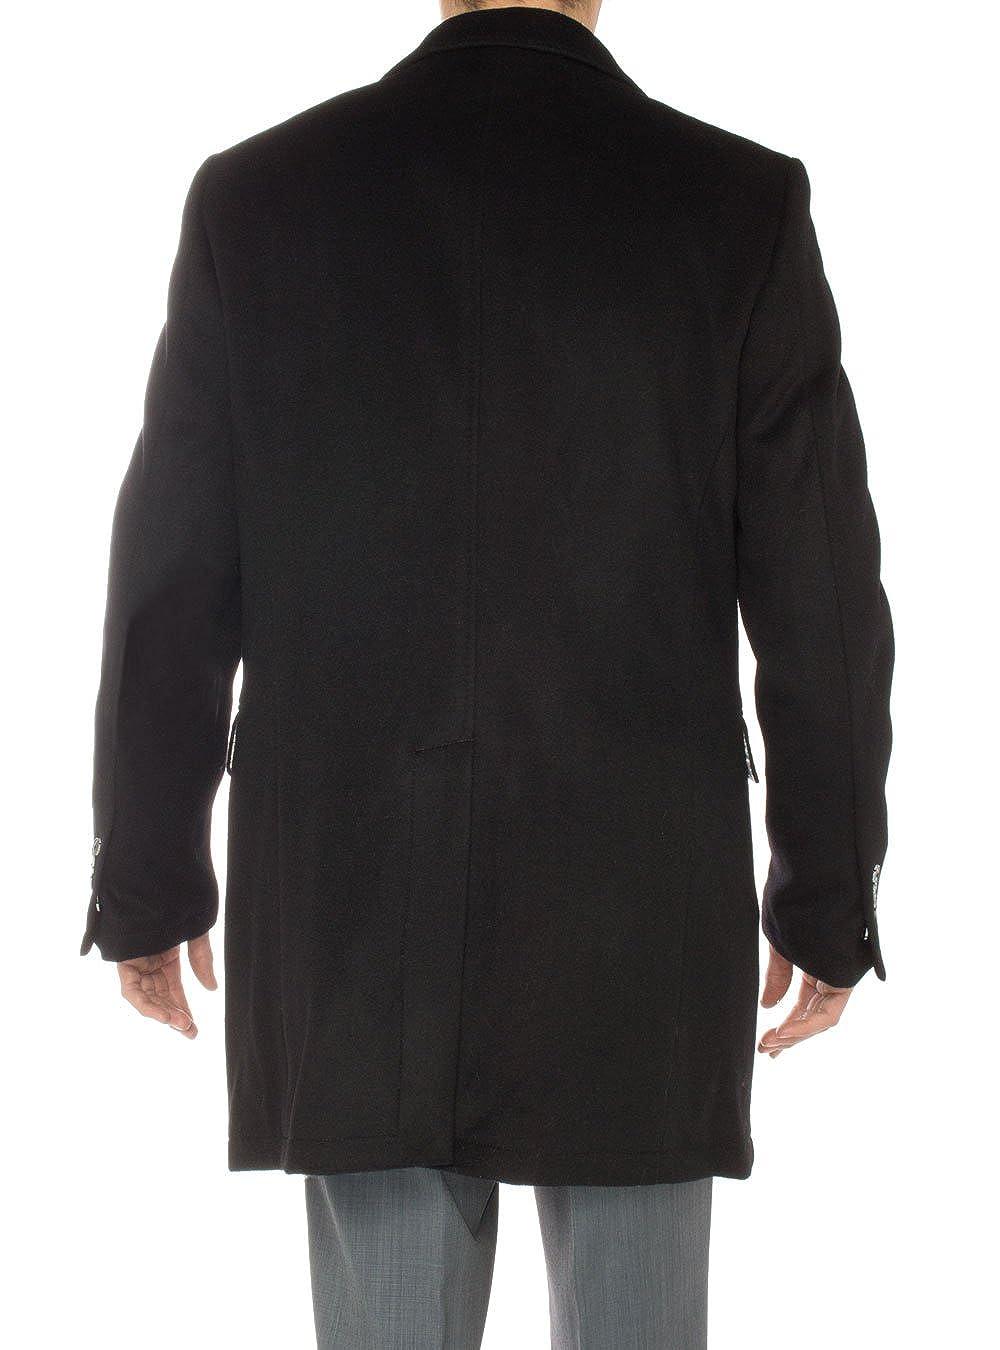 LN LUCIANO NATAZZI Mens Cashmere Trench Coat Classic Modern Topcoat Overcoat